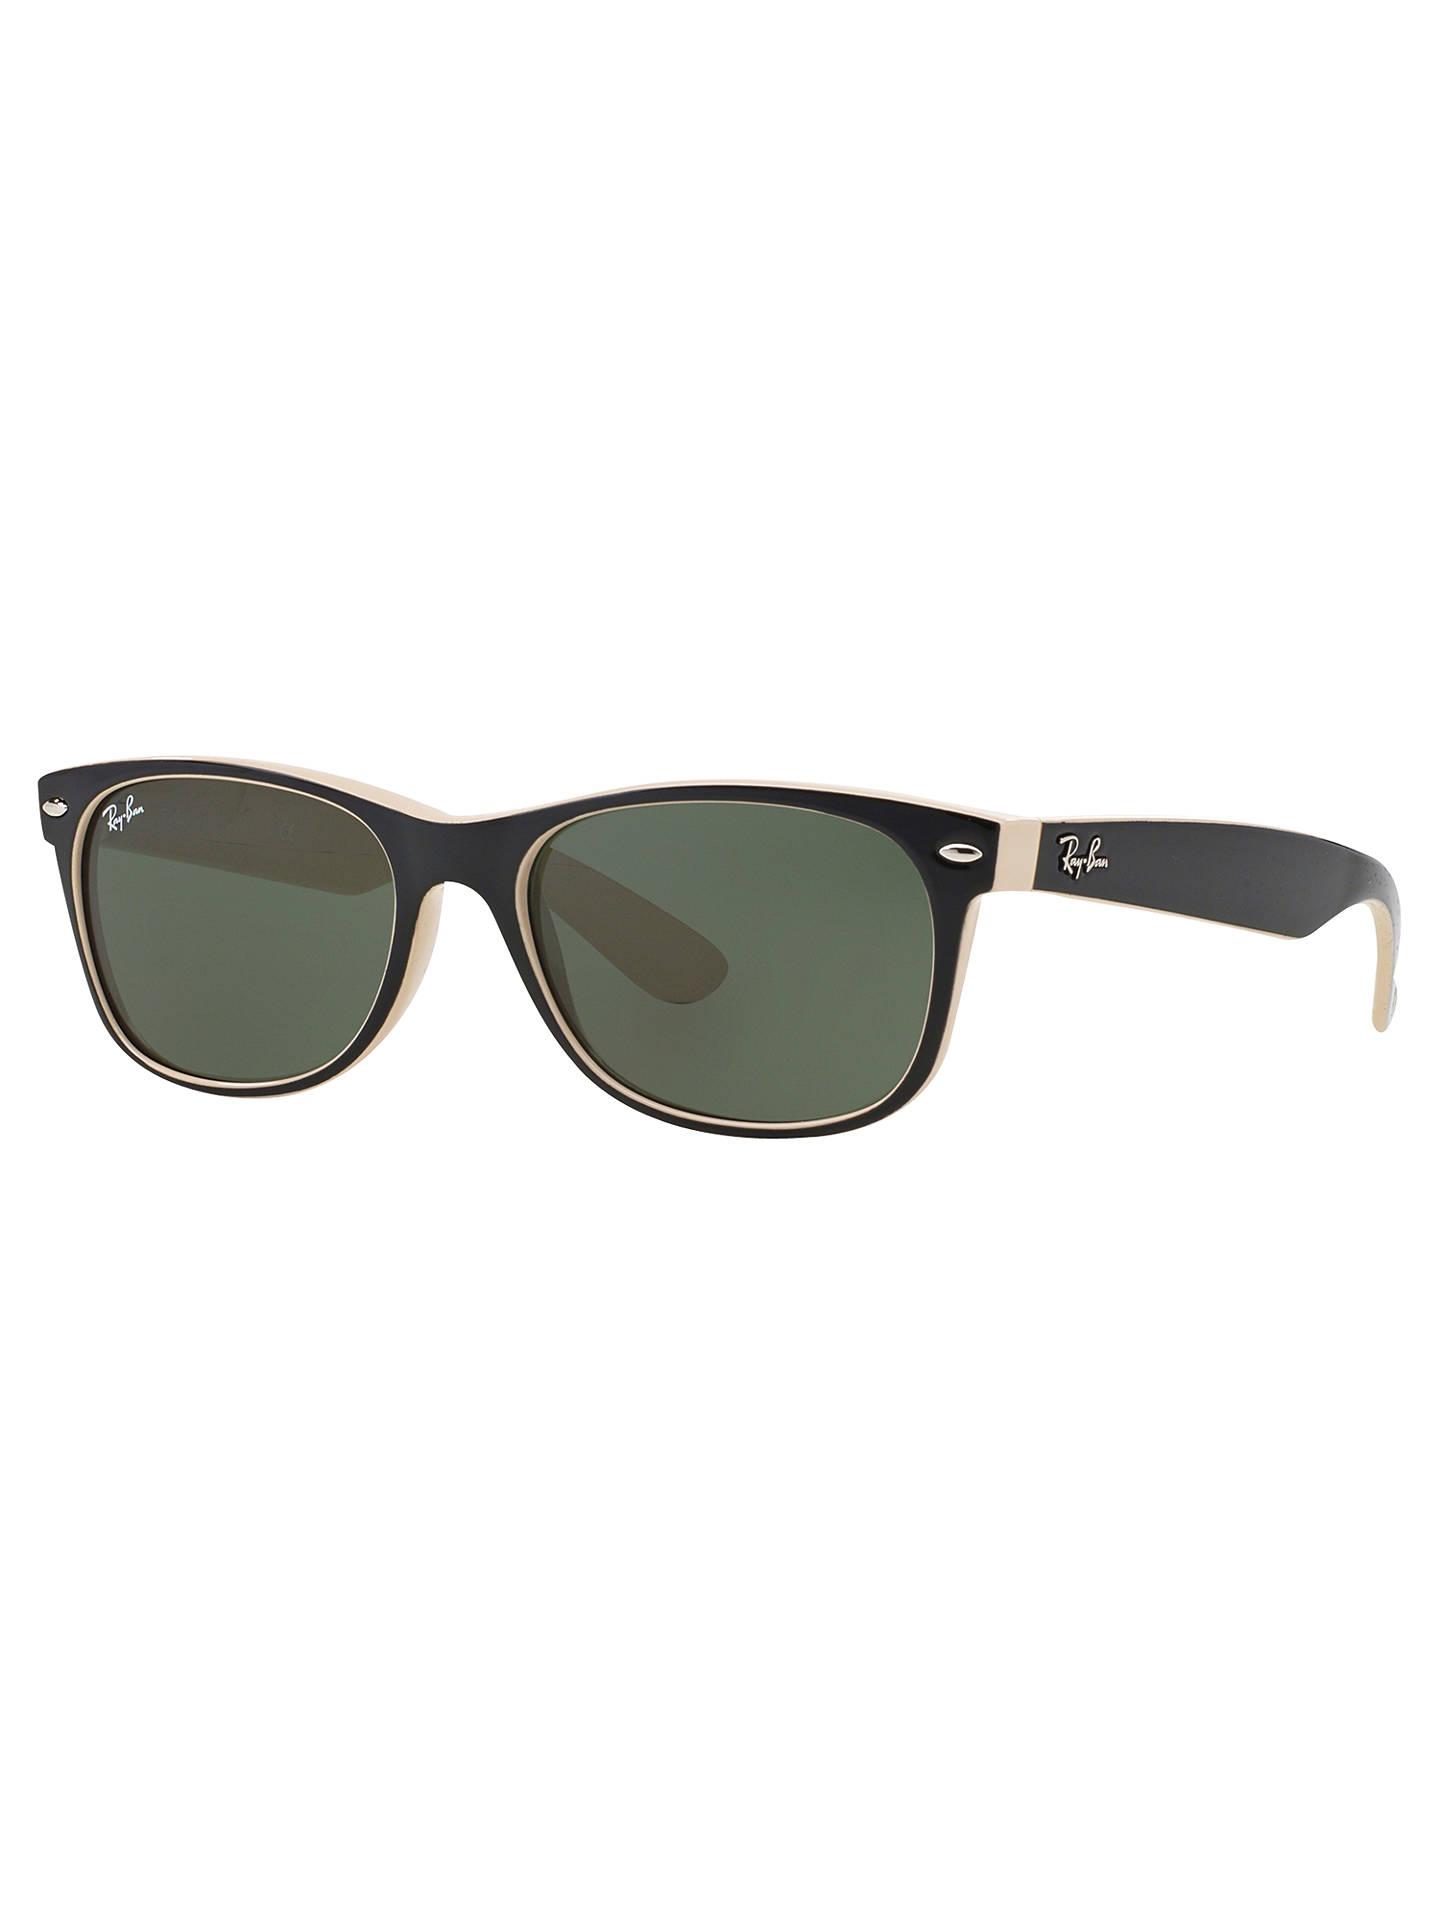 107b88d8af768 Ray-Ban RB2132 New Wayfarer Colour Mix Sunglasses at John Lewis ...